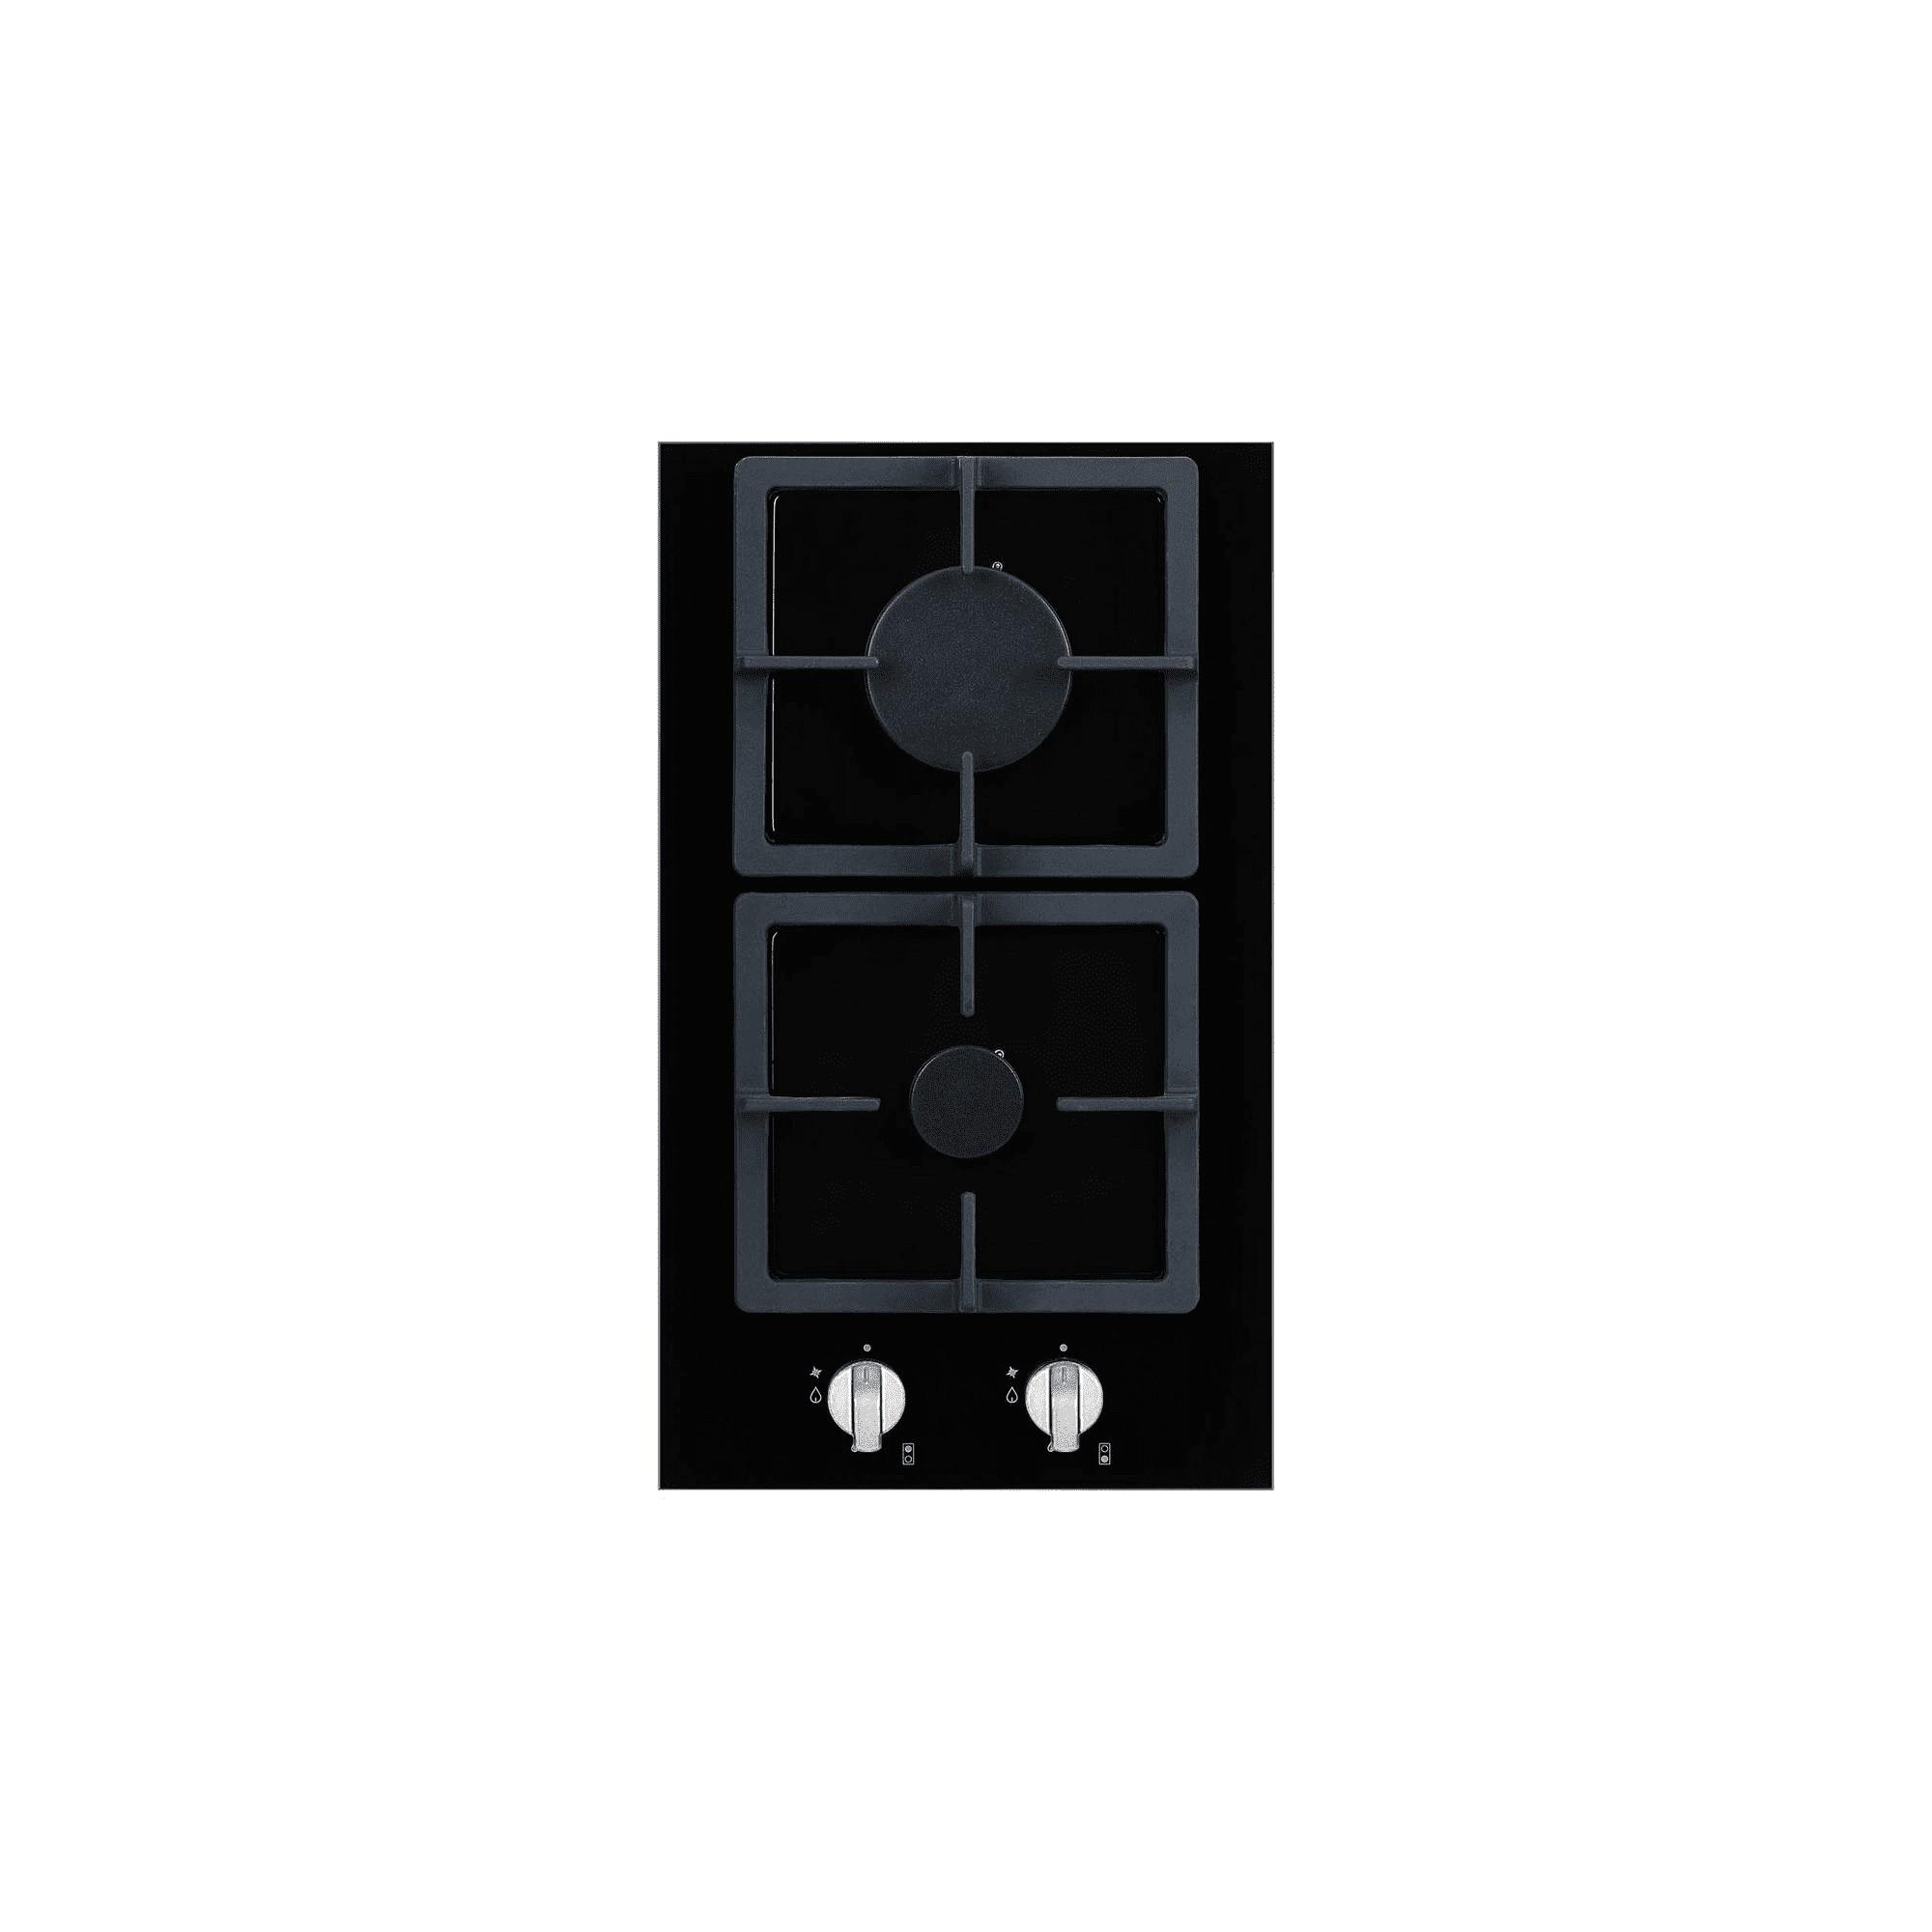 http://www.bbplace.fr/255-733-thickbox/domino-gaz-curtiss-2-feux-noir-verre-encastrable.jpg